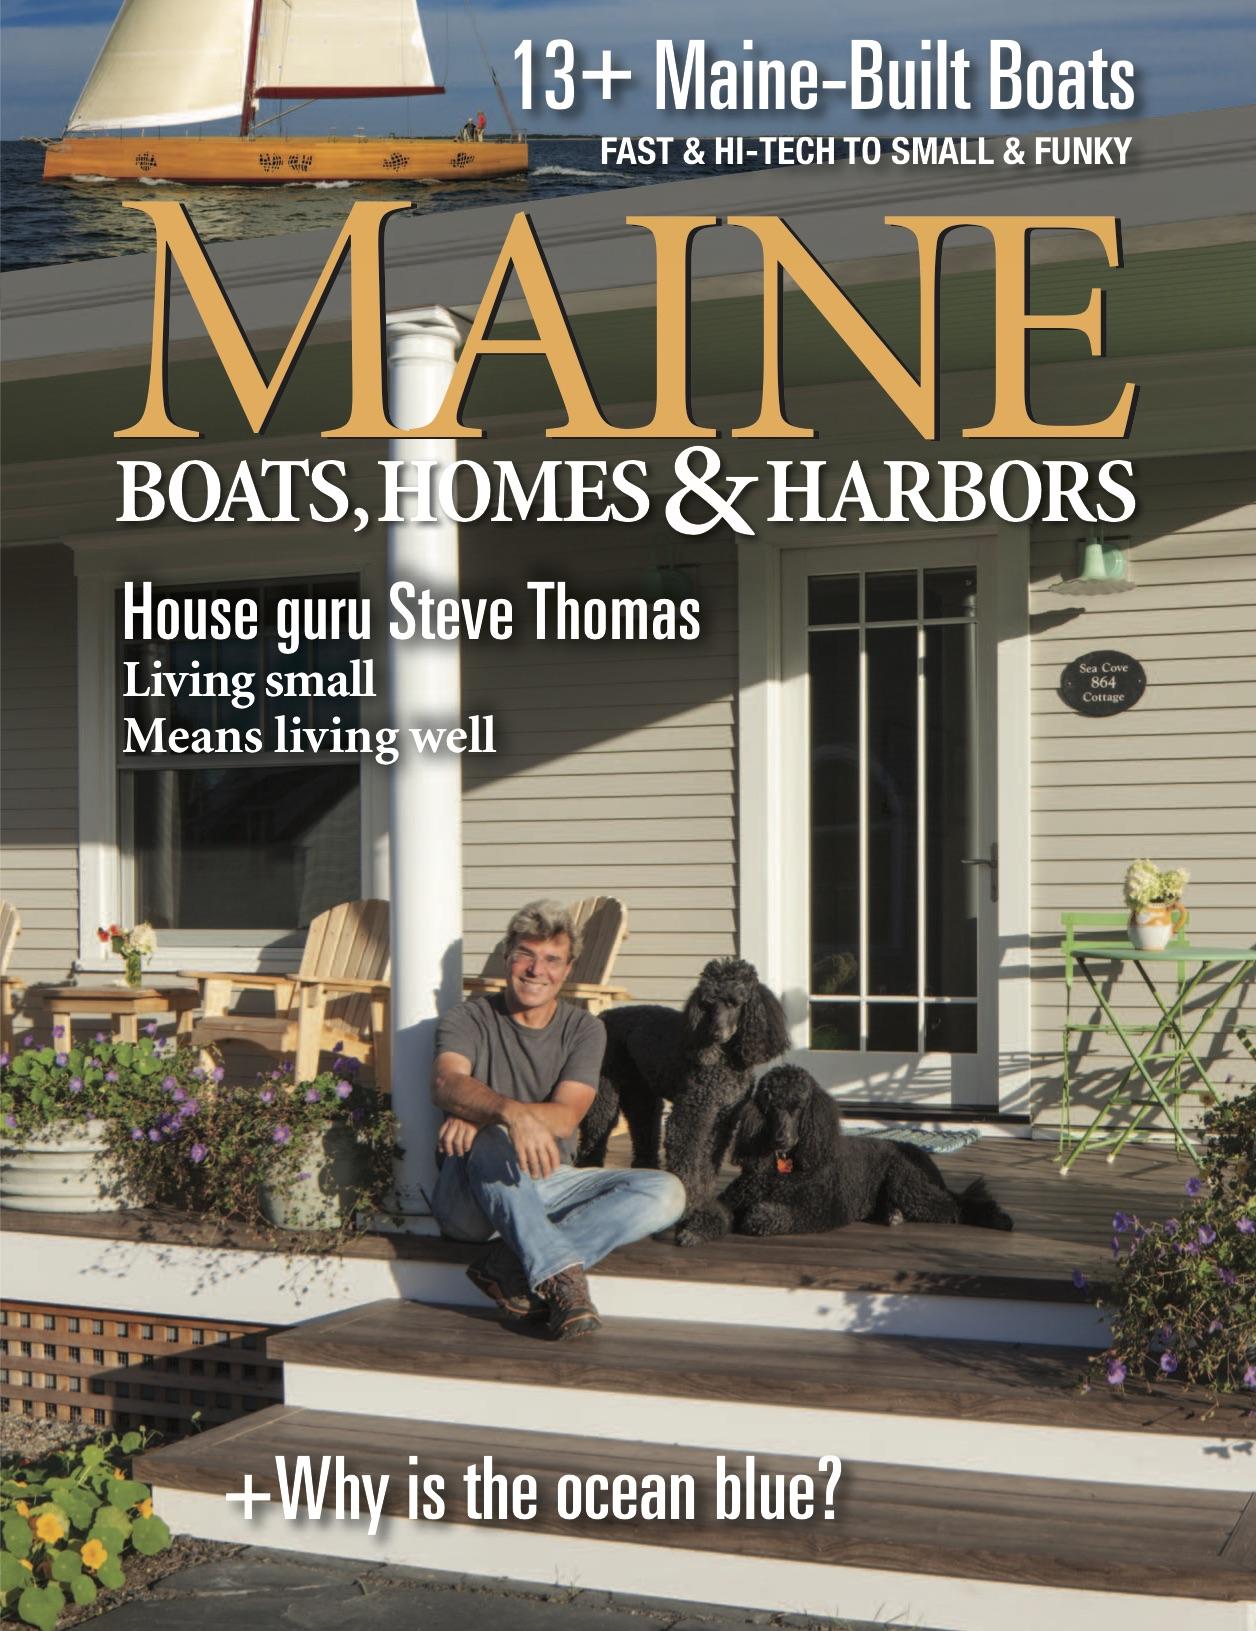 Maine Boats & Hbrs1.jpg